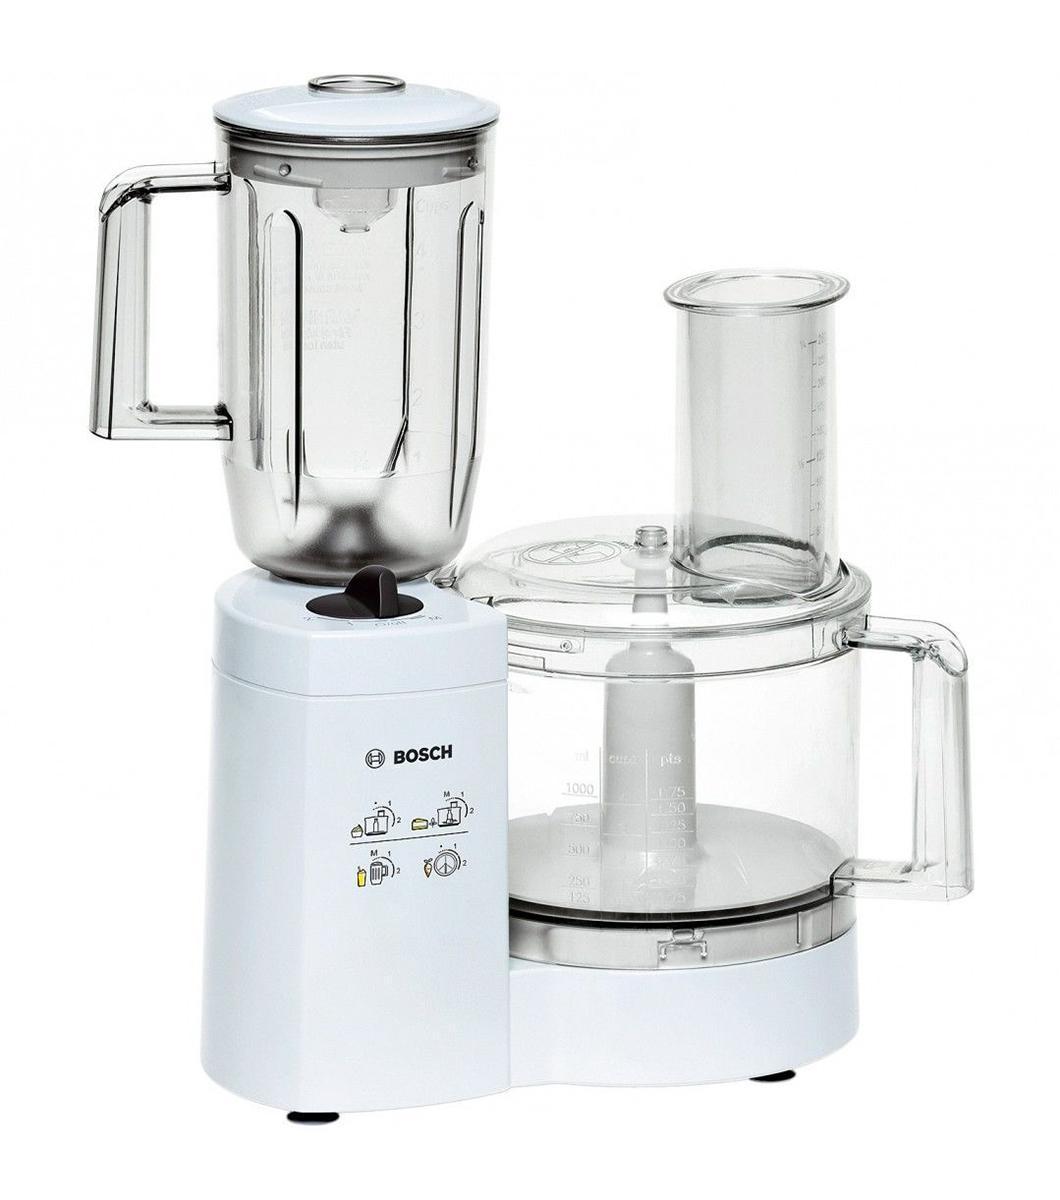 Bosch MCM 2150 кухонный комбайн ( MCM 2150 )